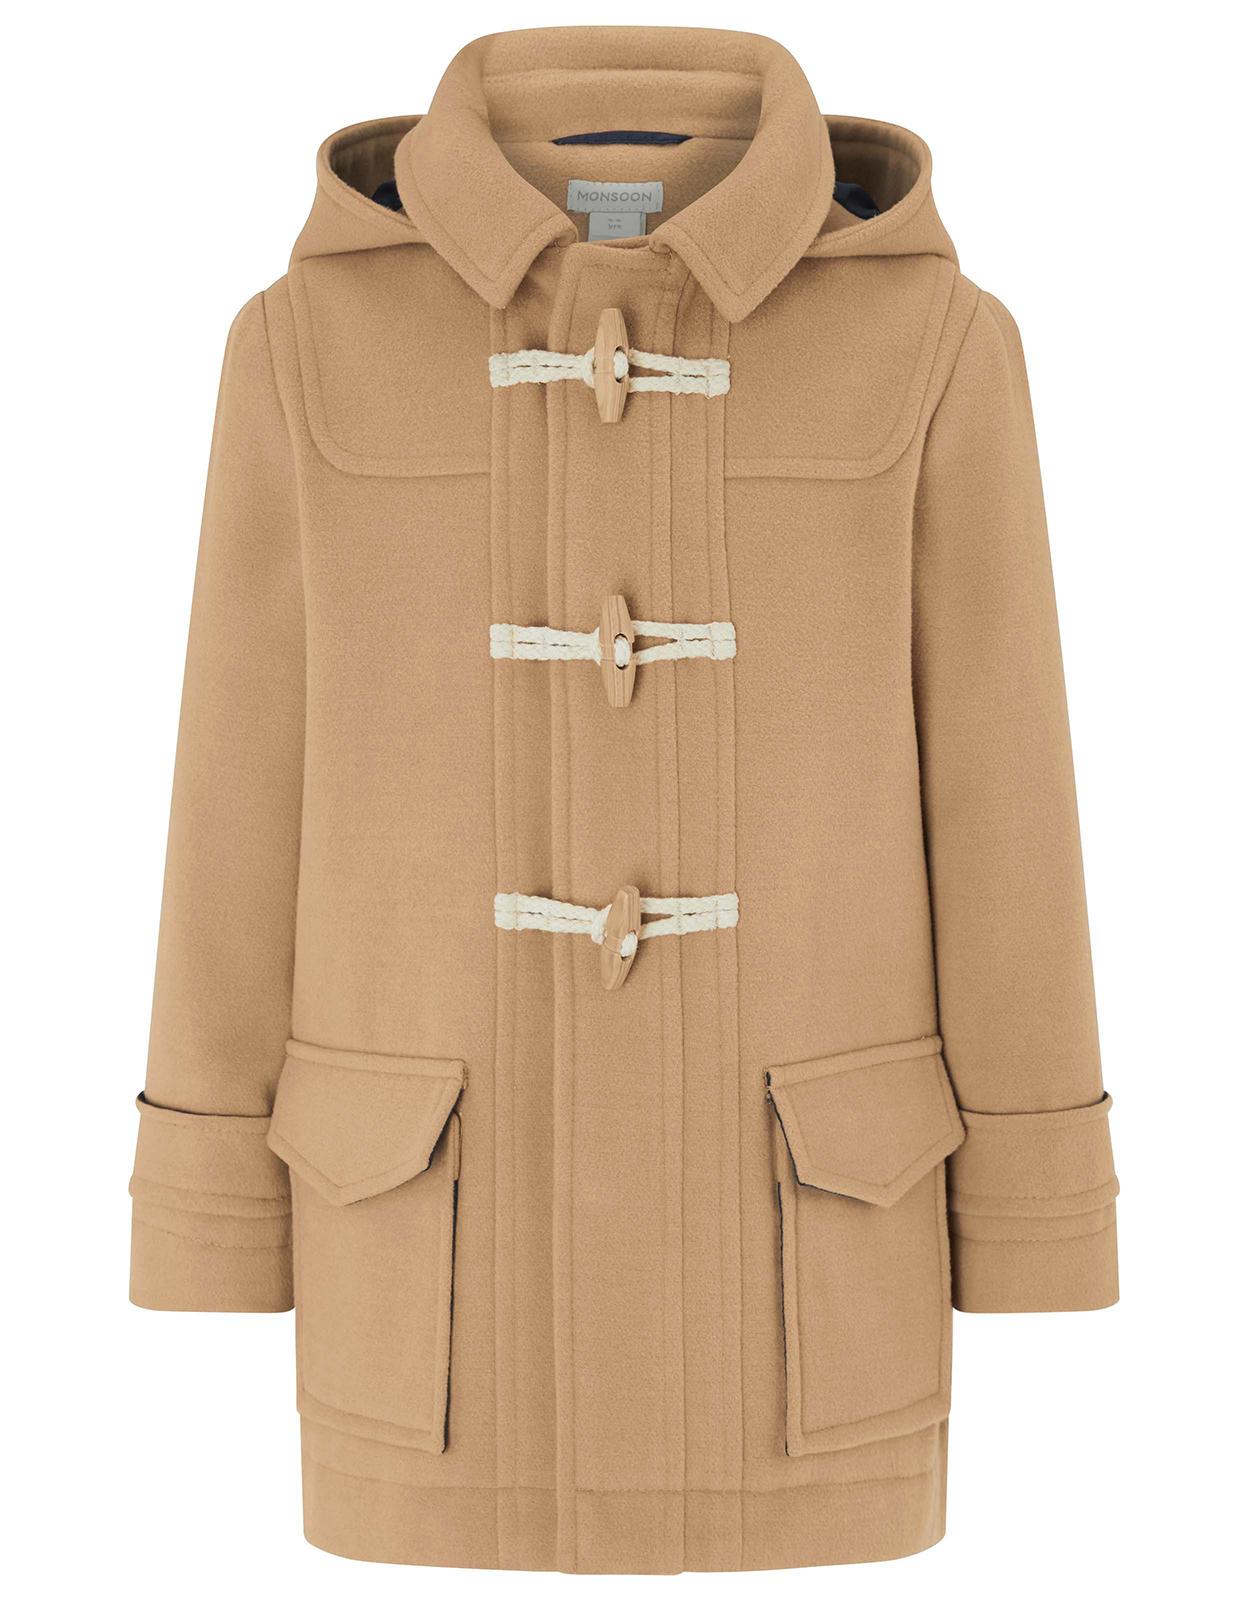 kids-camel-duffle-coat